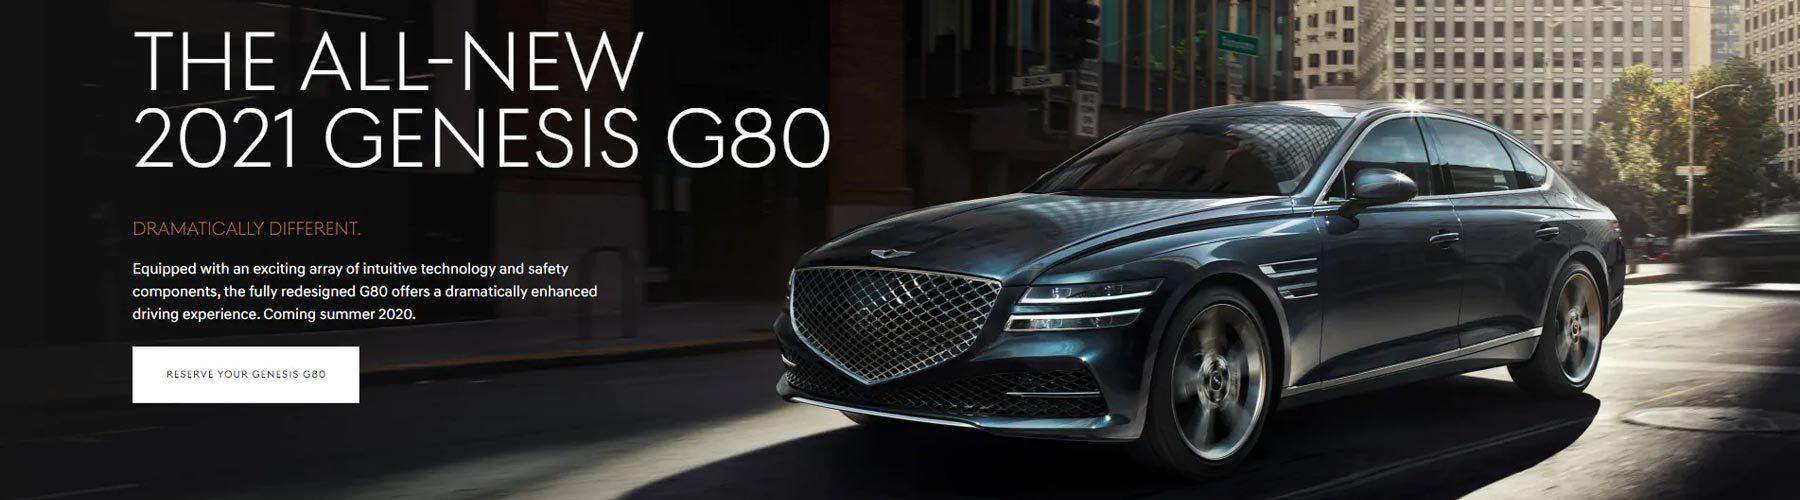 G80 2021